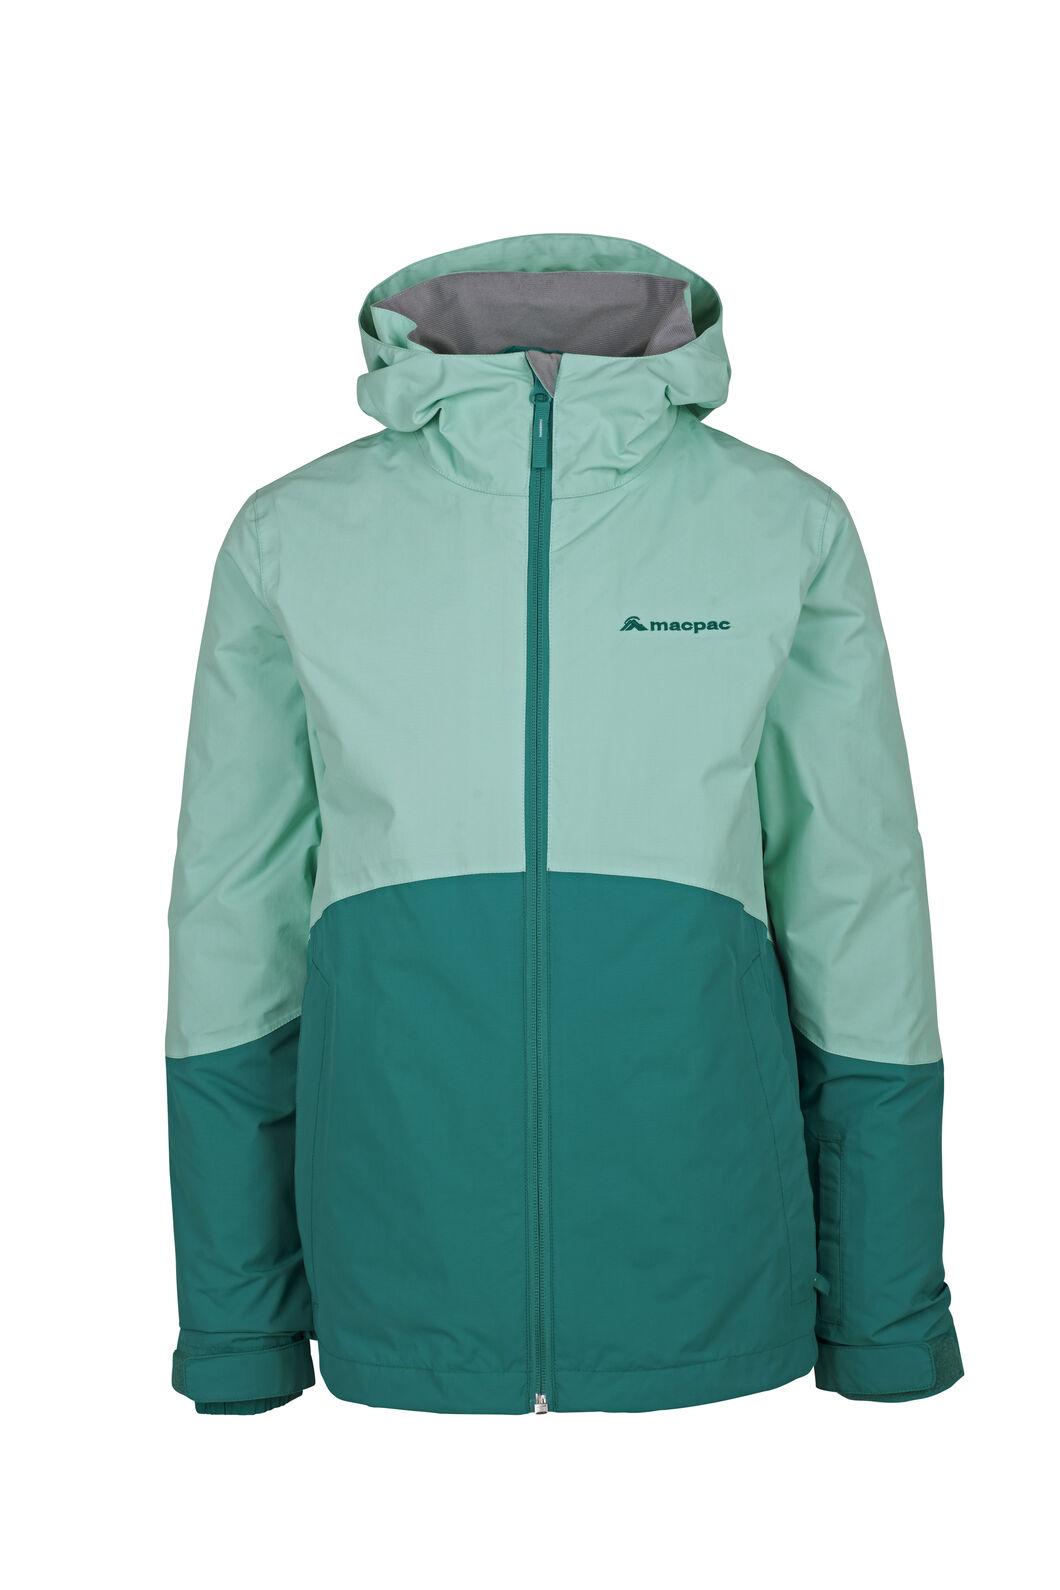 Macpac Snowdrift 3-in-1 Ski Jacket, Ocean Wave, hi-res